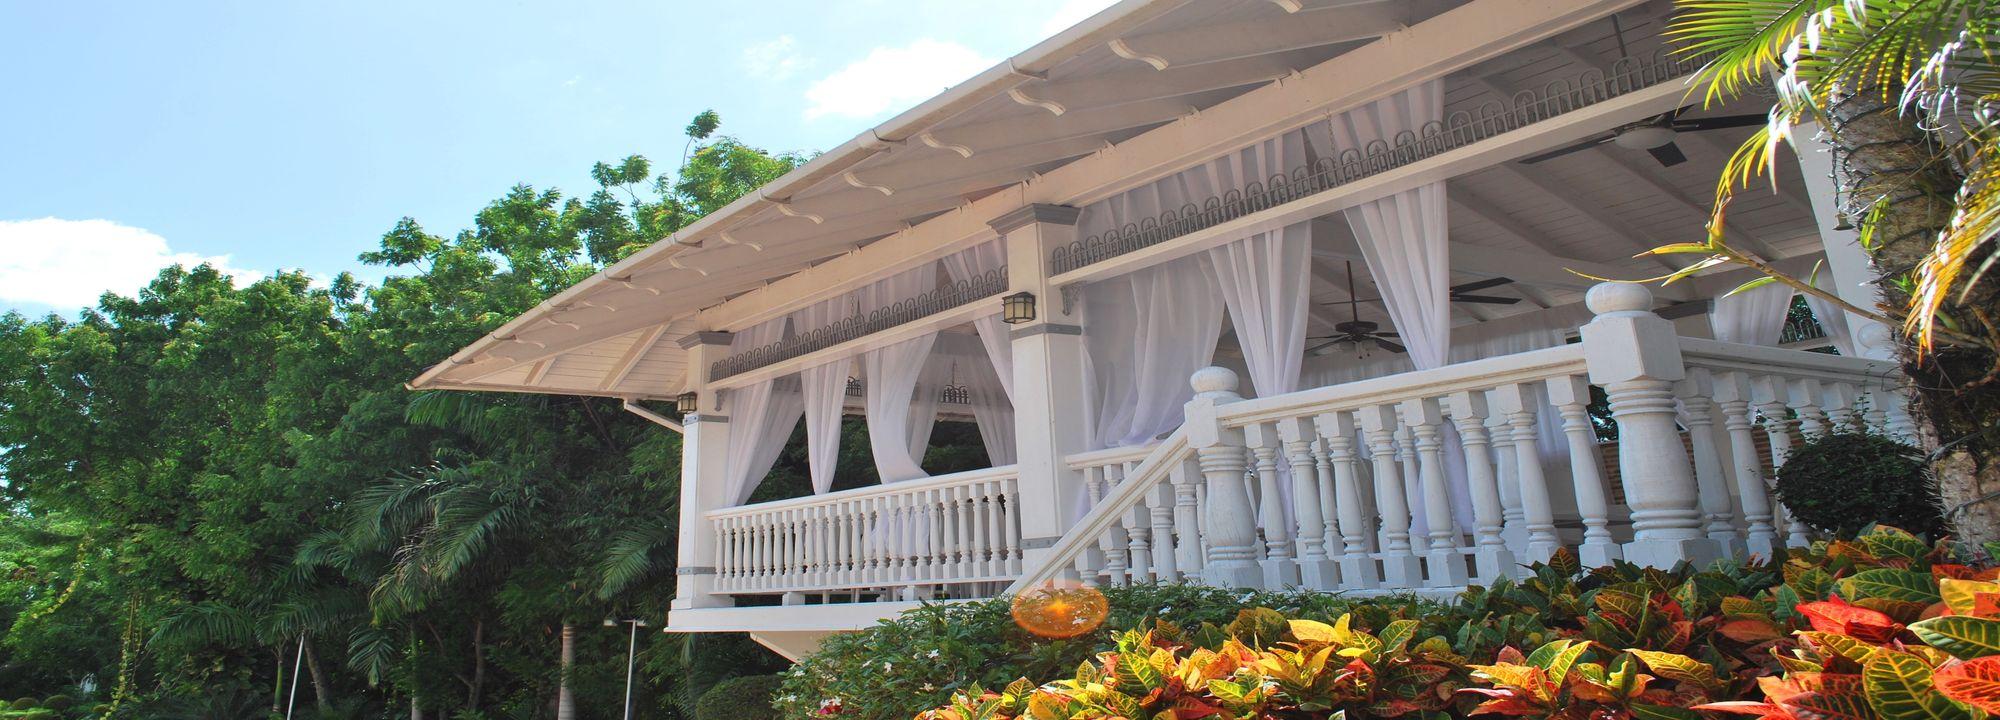 Hotel terrace overlooking garden at Platino Hotel & Casino located in Santiago Dominican Republic